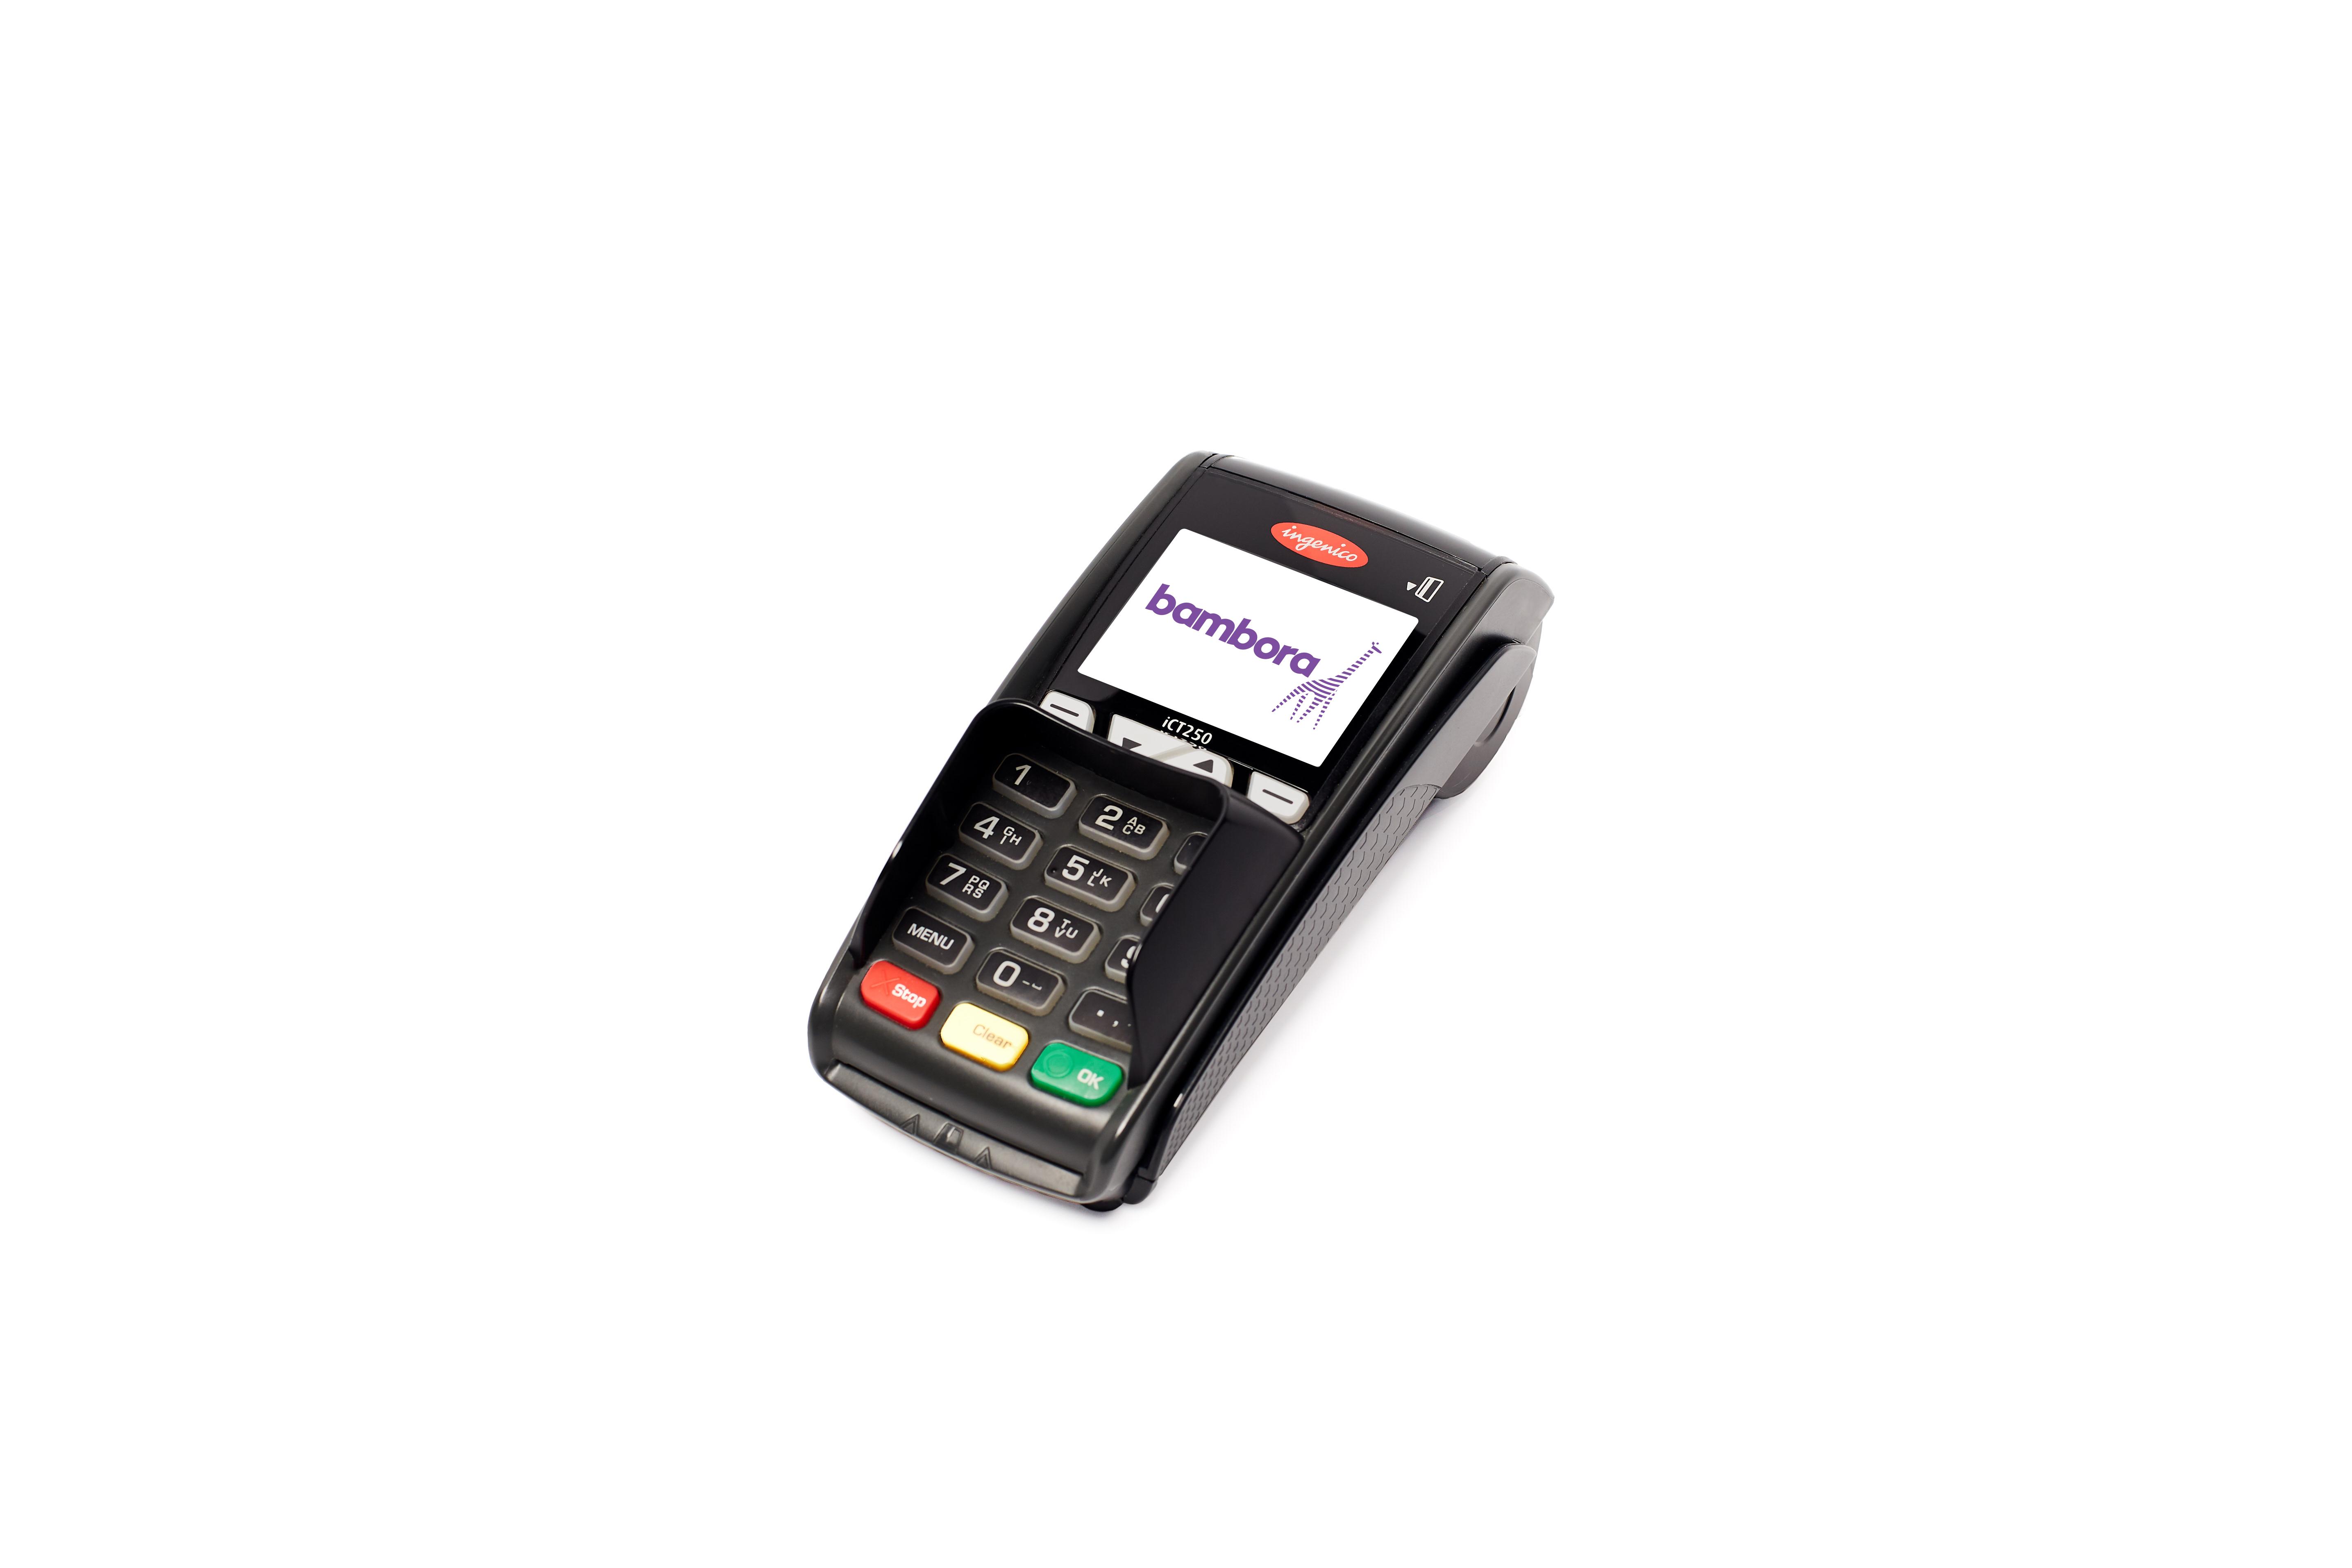 Korttidsleie betalingsterminal 00003